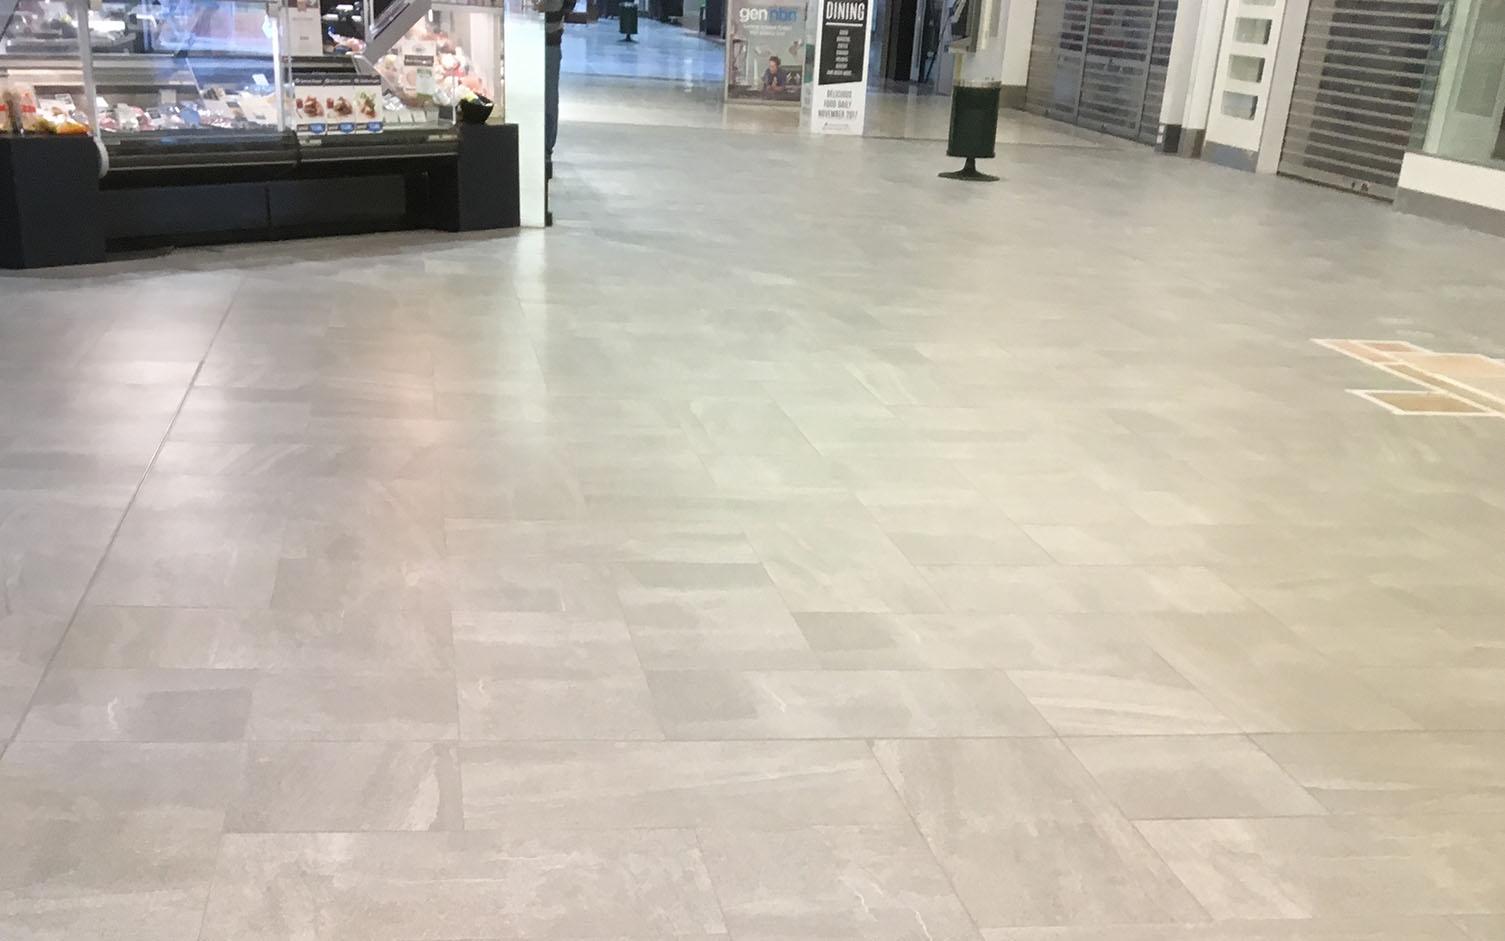 https://ggtiling.com.au/wp-content/uploads/2018/11/G-and-G-Tiling-Golden-Grove-Shopping-Centre_0029_30.jpg